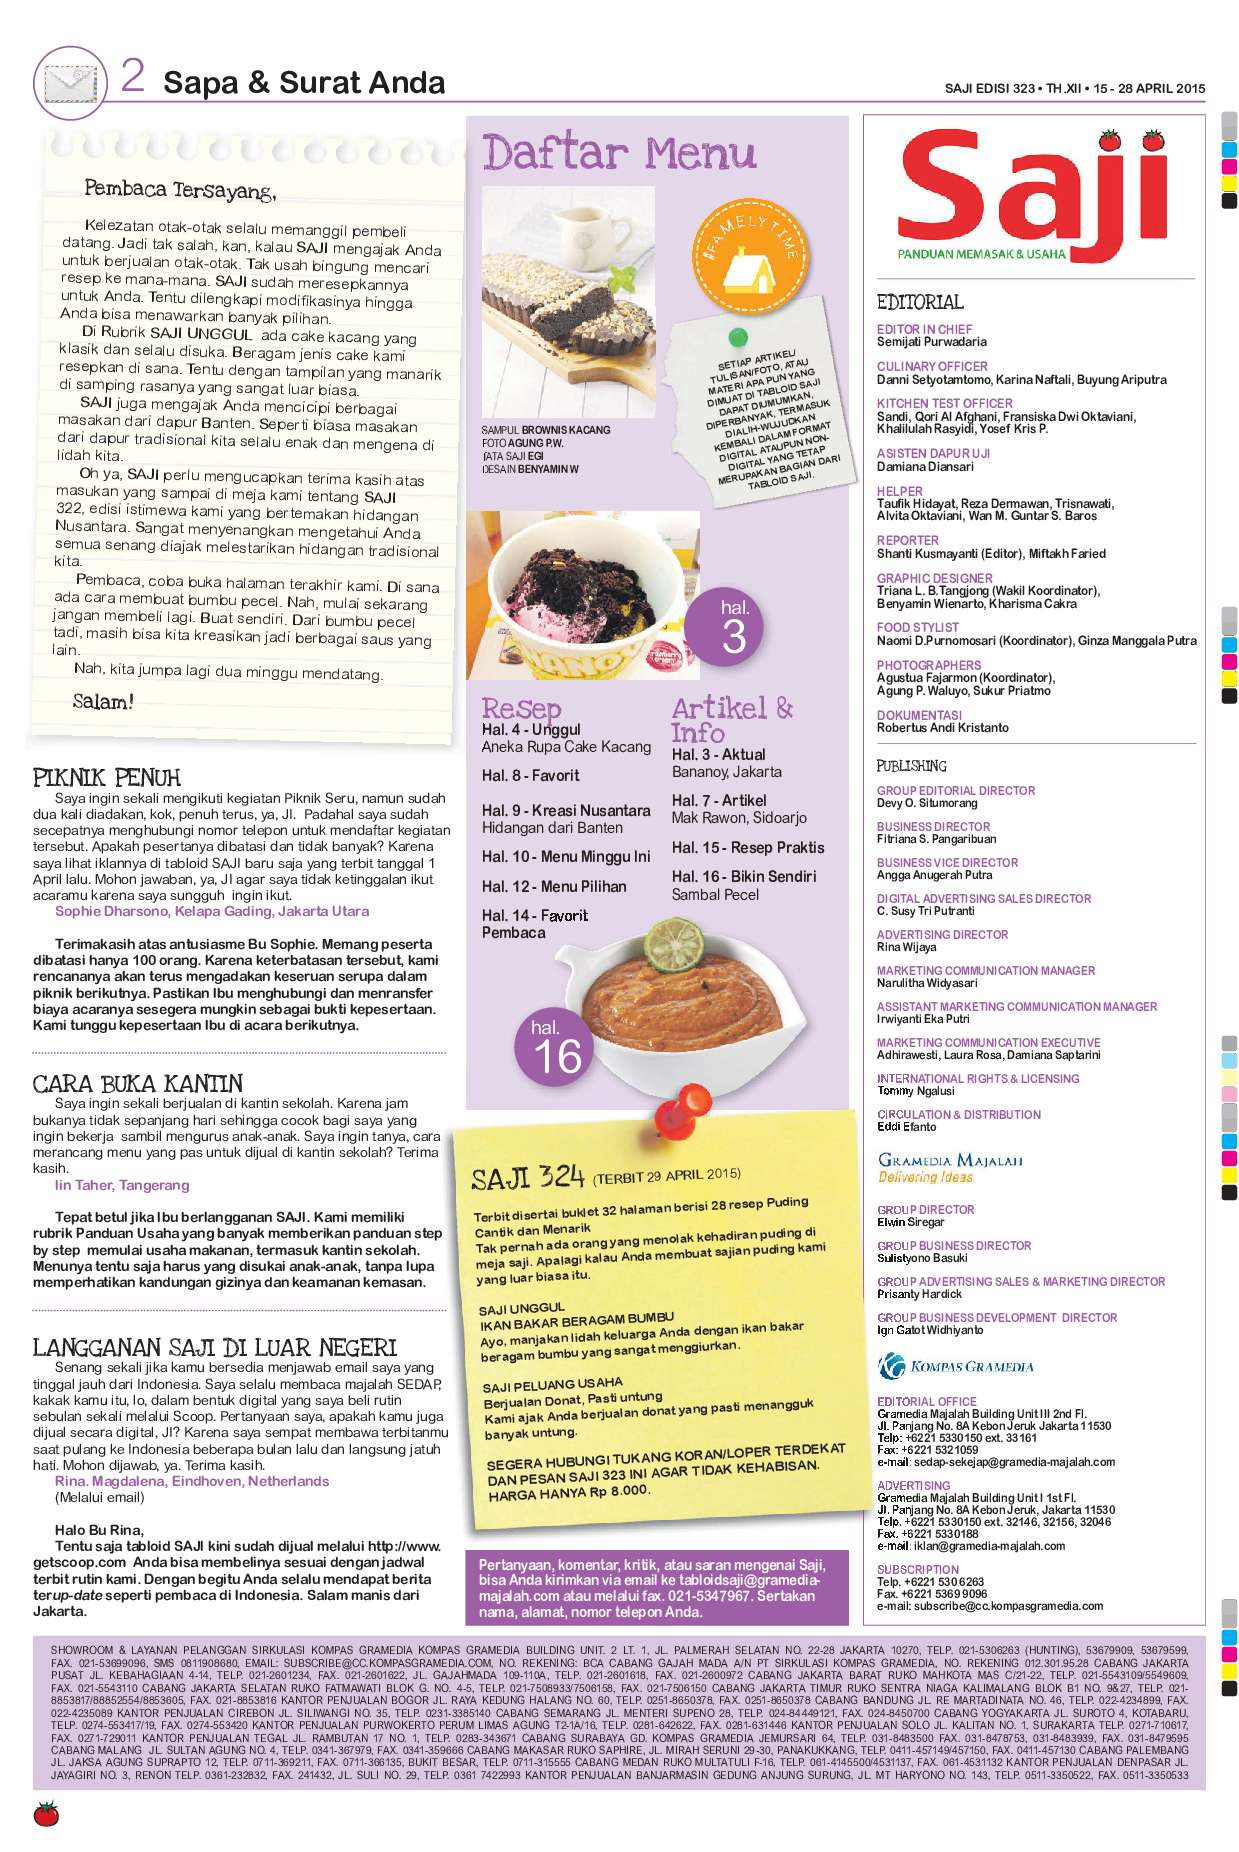 Saji Magazine Ed 323 2015 Gramedia Digital Kacang Sambal By Dua Putri Bjb 3